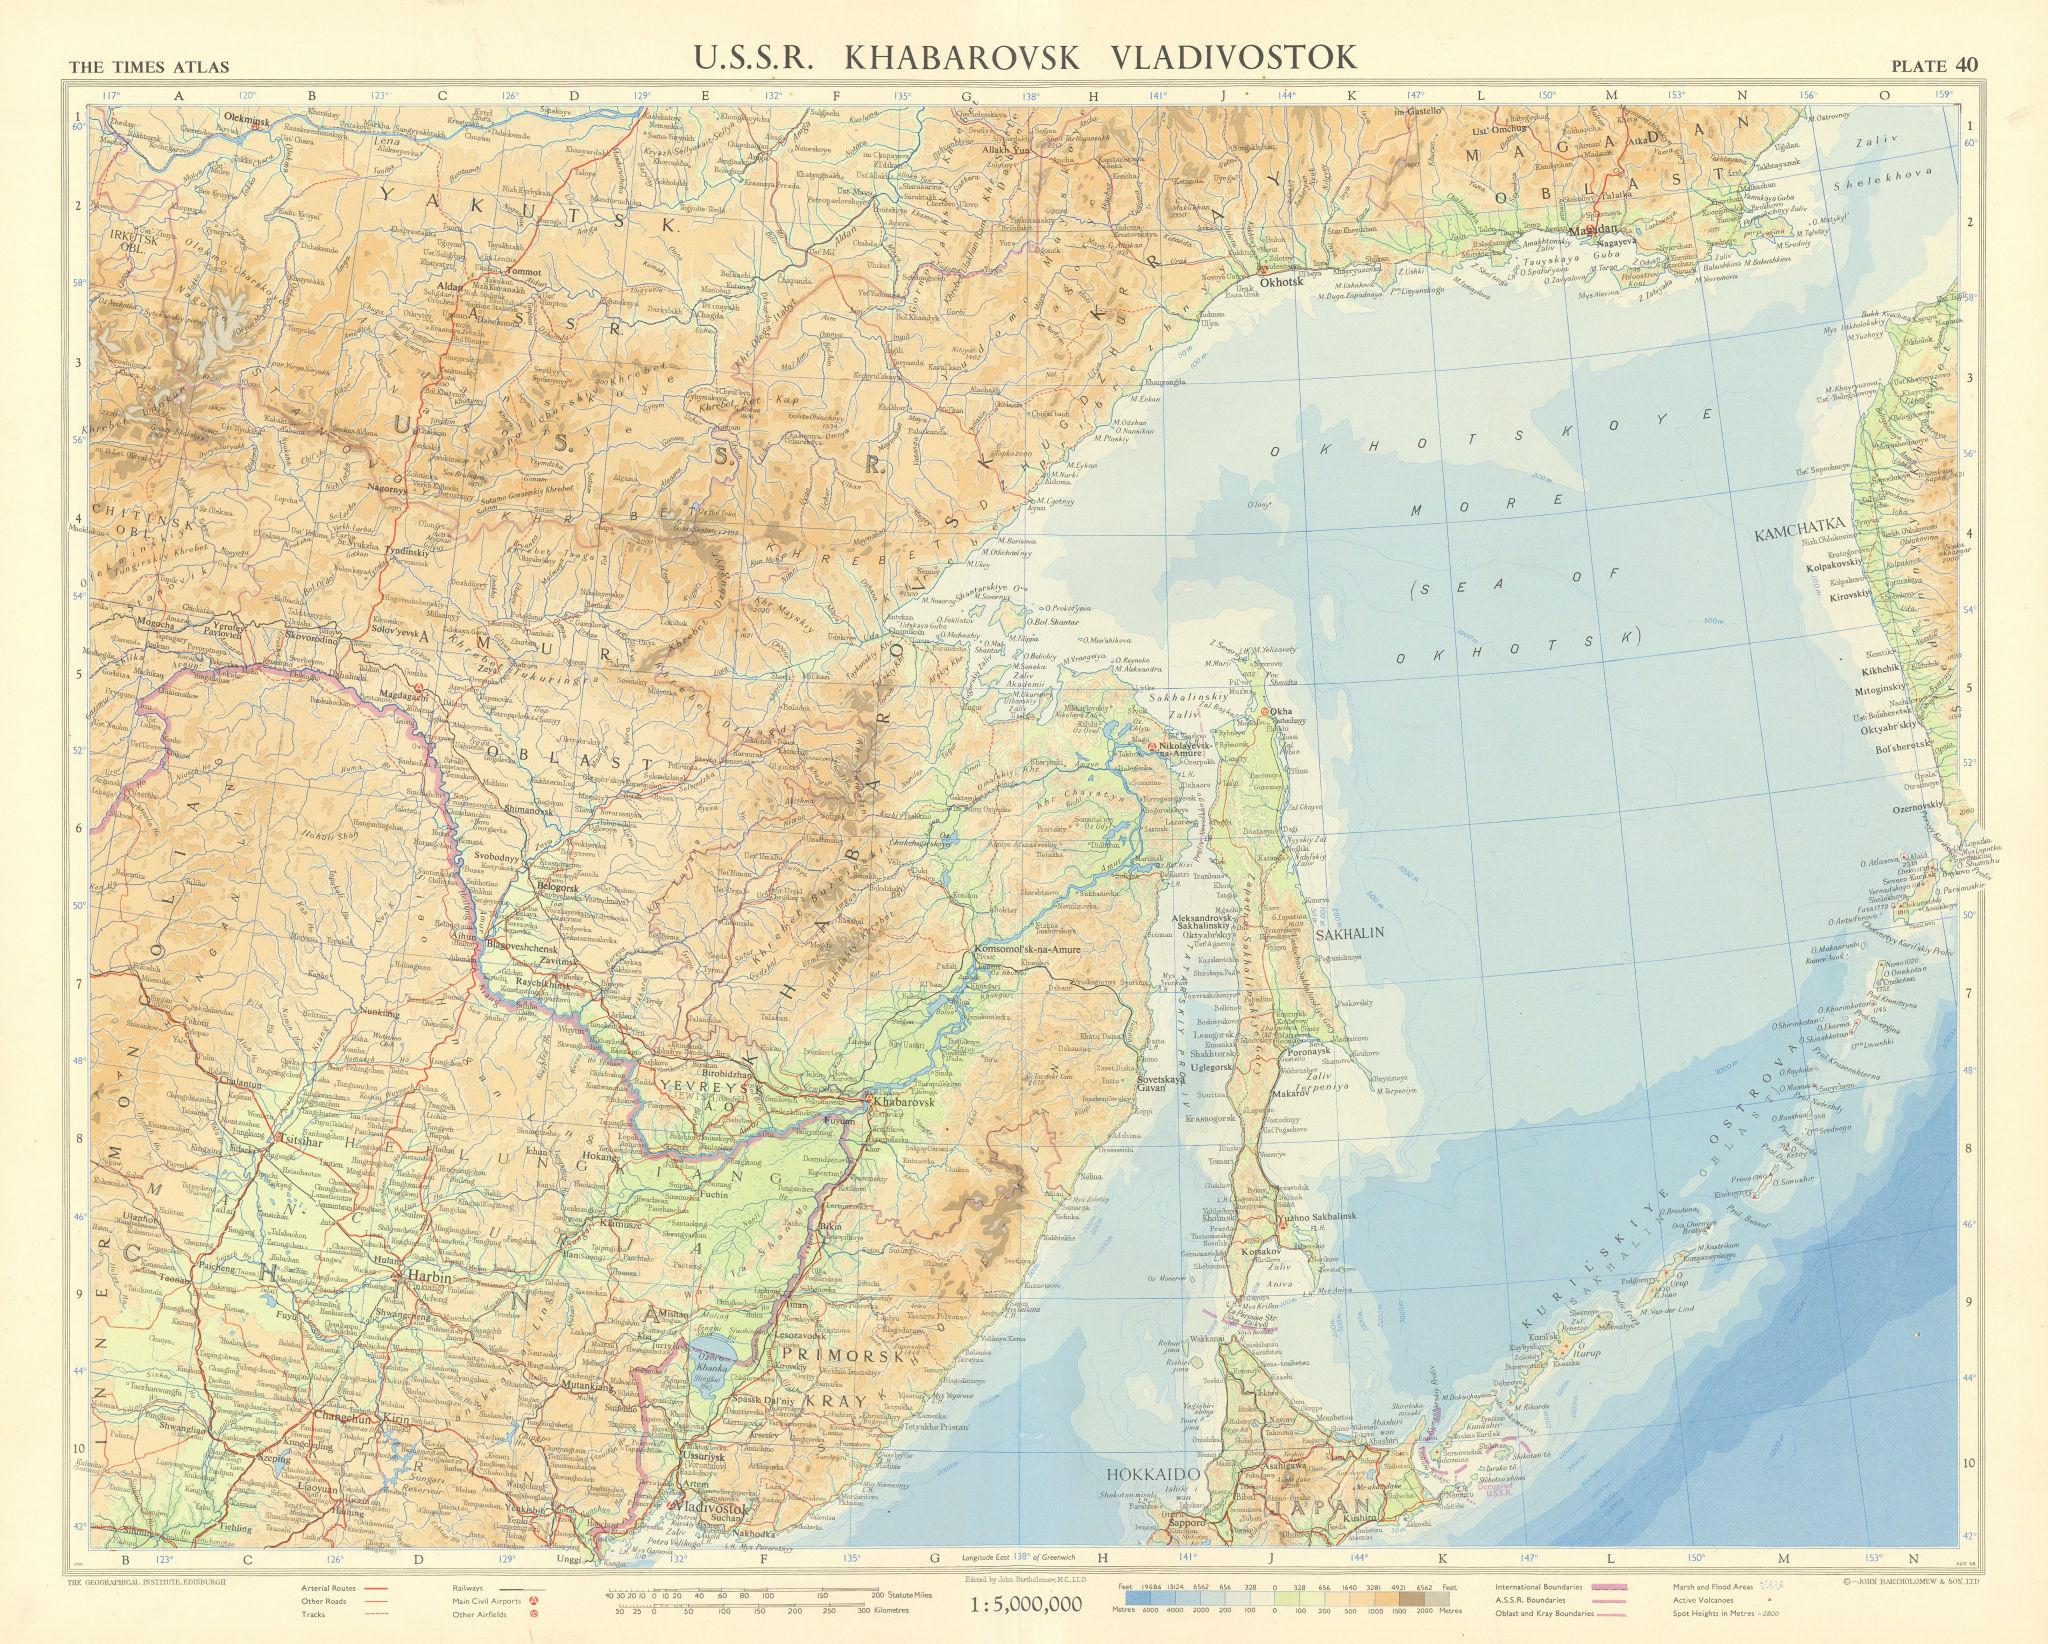 USSR Russian Far East. Khabarovsk. Vladivostok Sakhalin. China. TIMES 1959 map